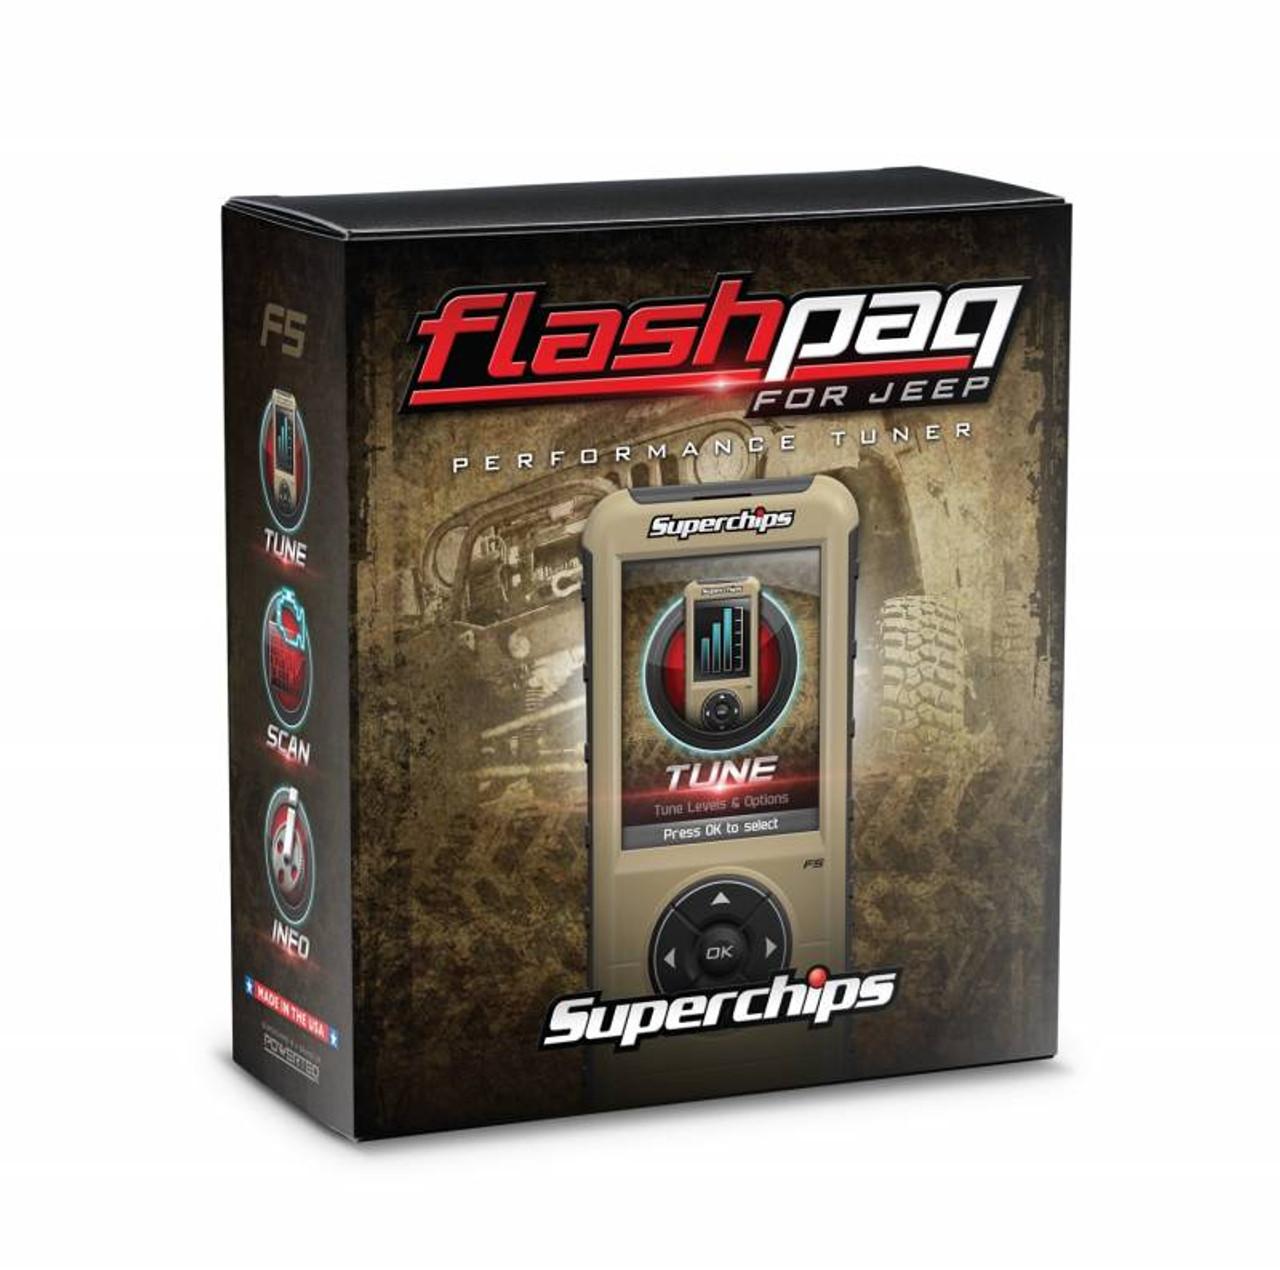 Superchips Flashpaq F5 Programmer